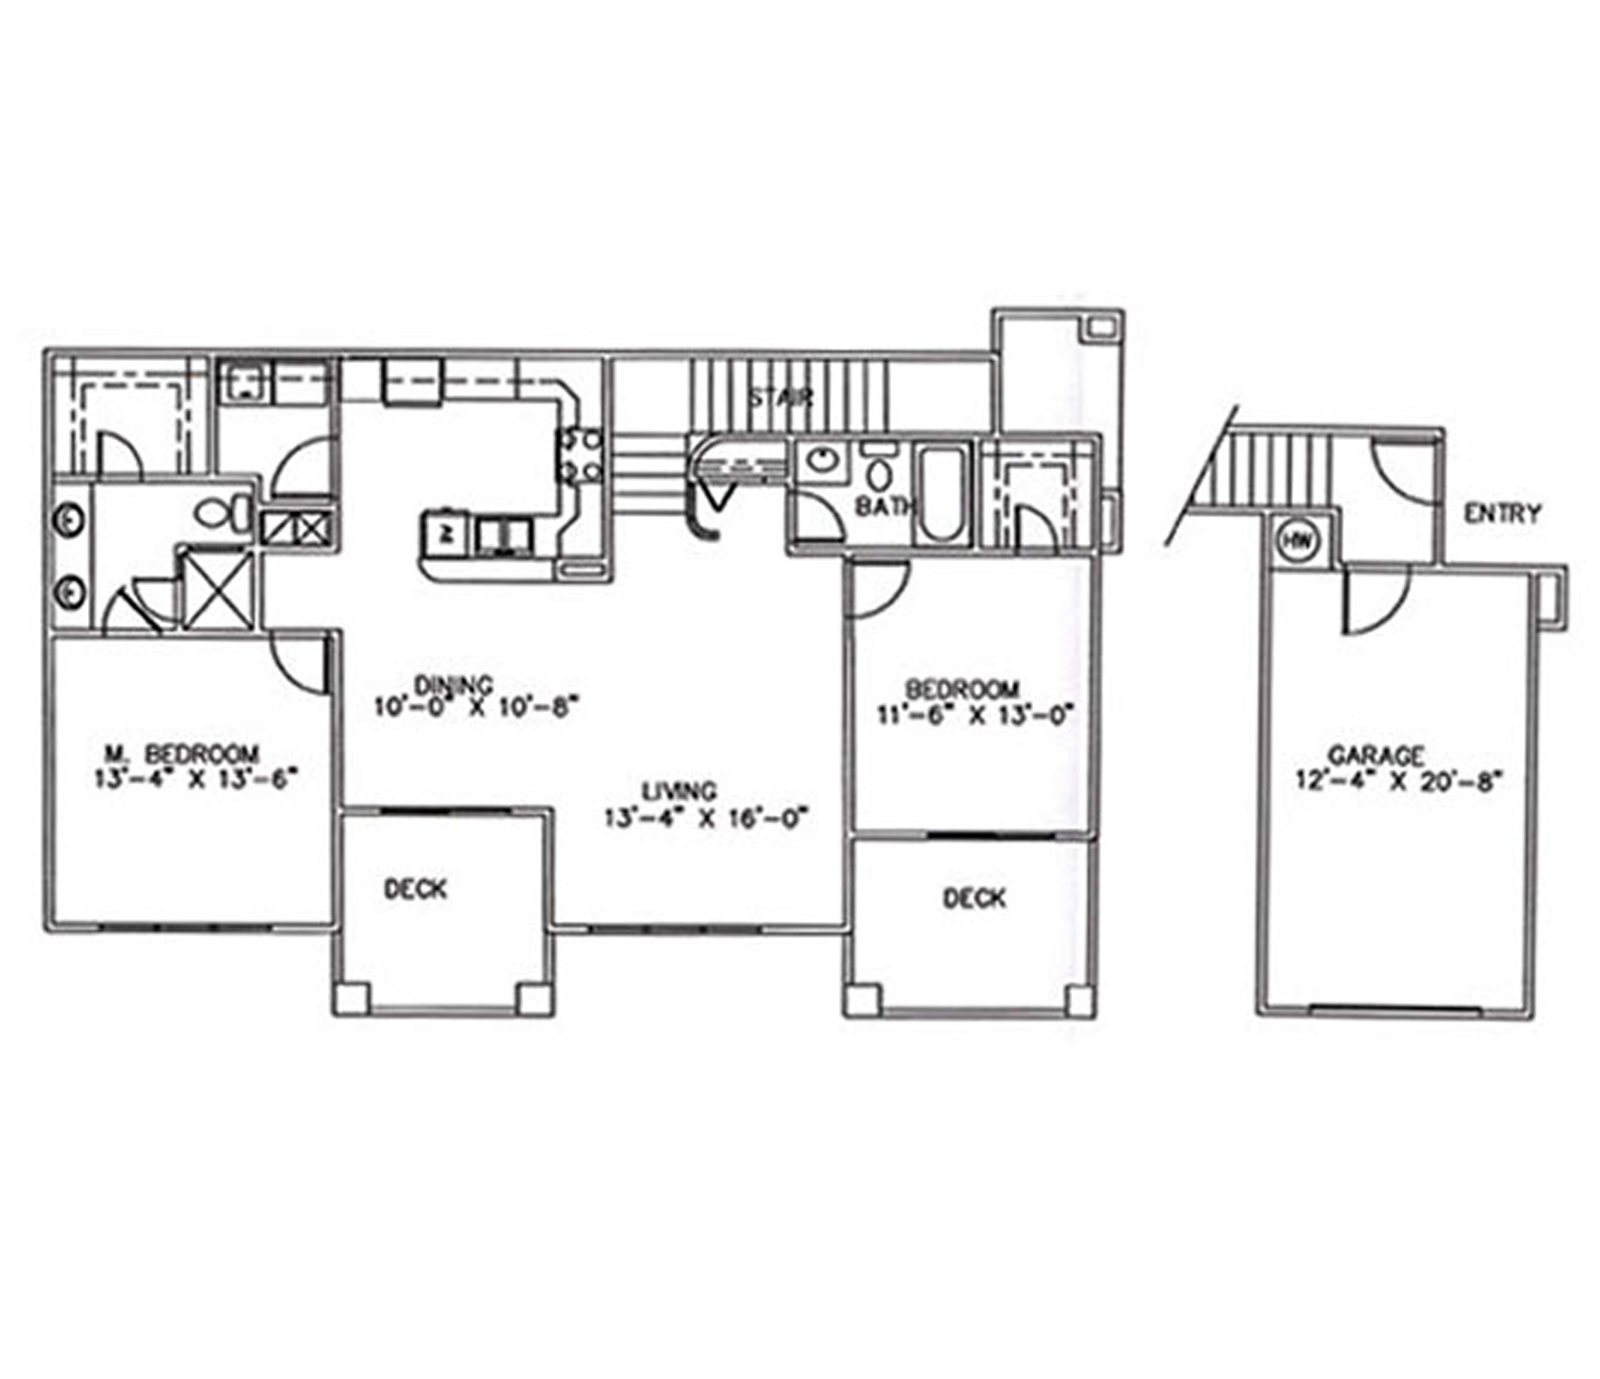 2 Bedrooms, 2 Baths, 1 Car Garage